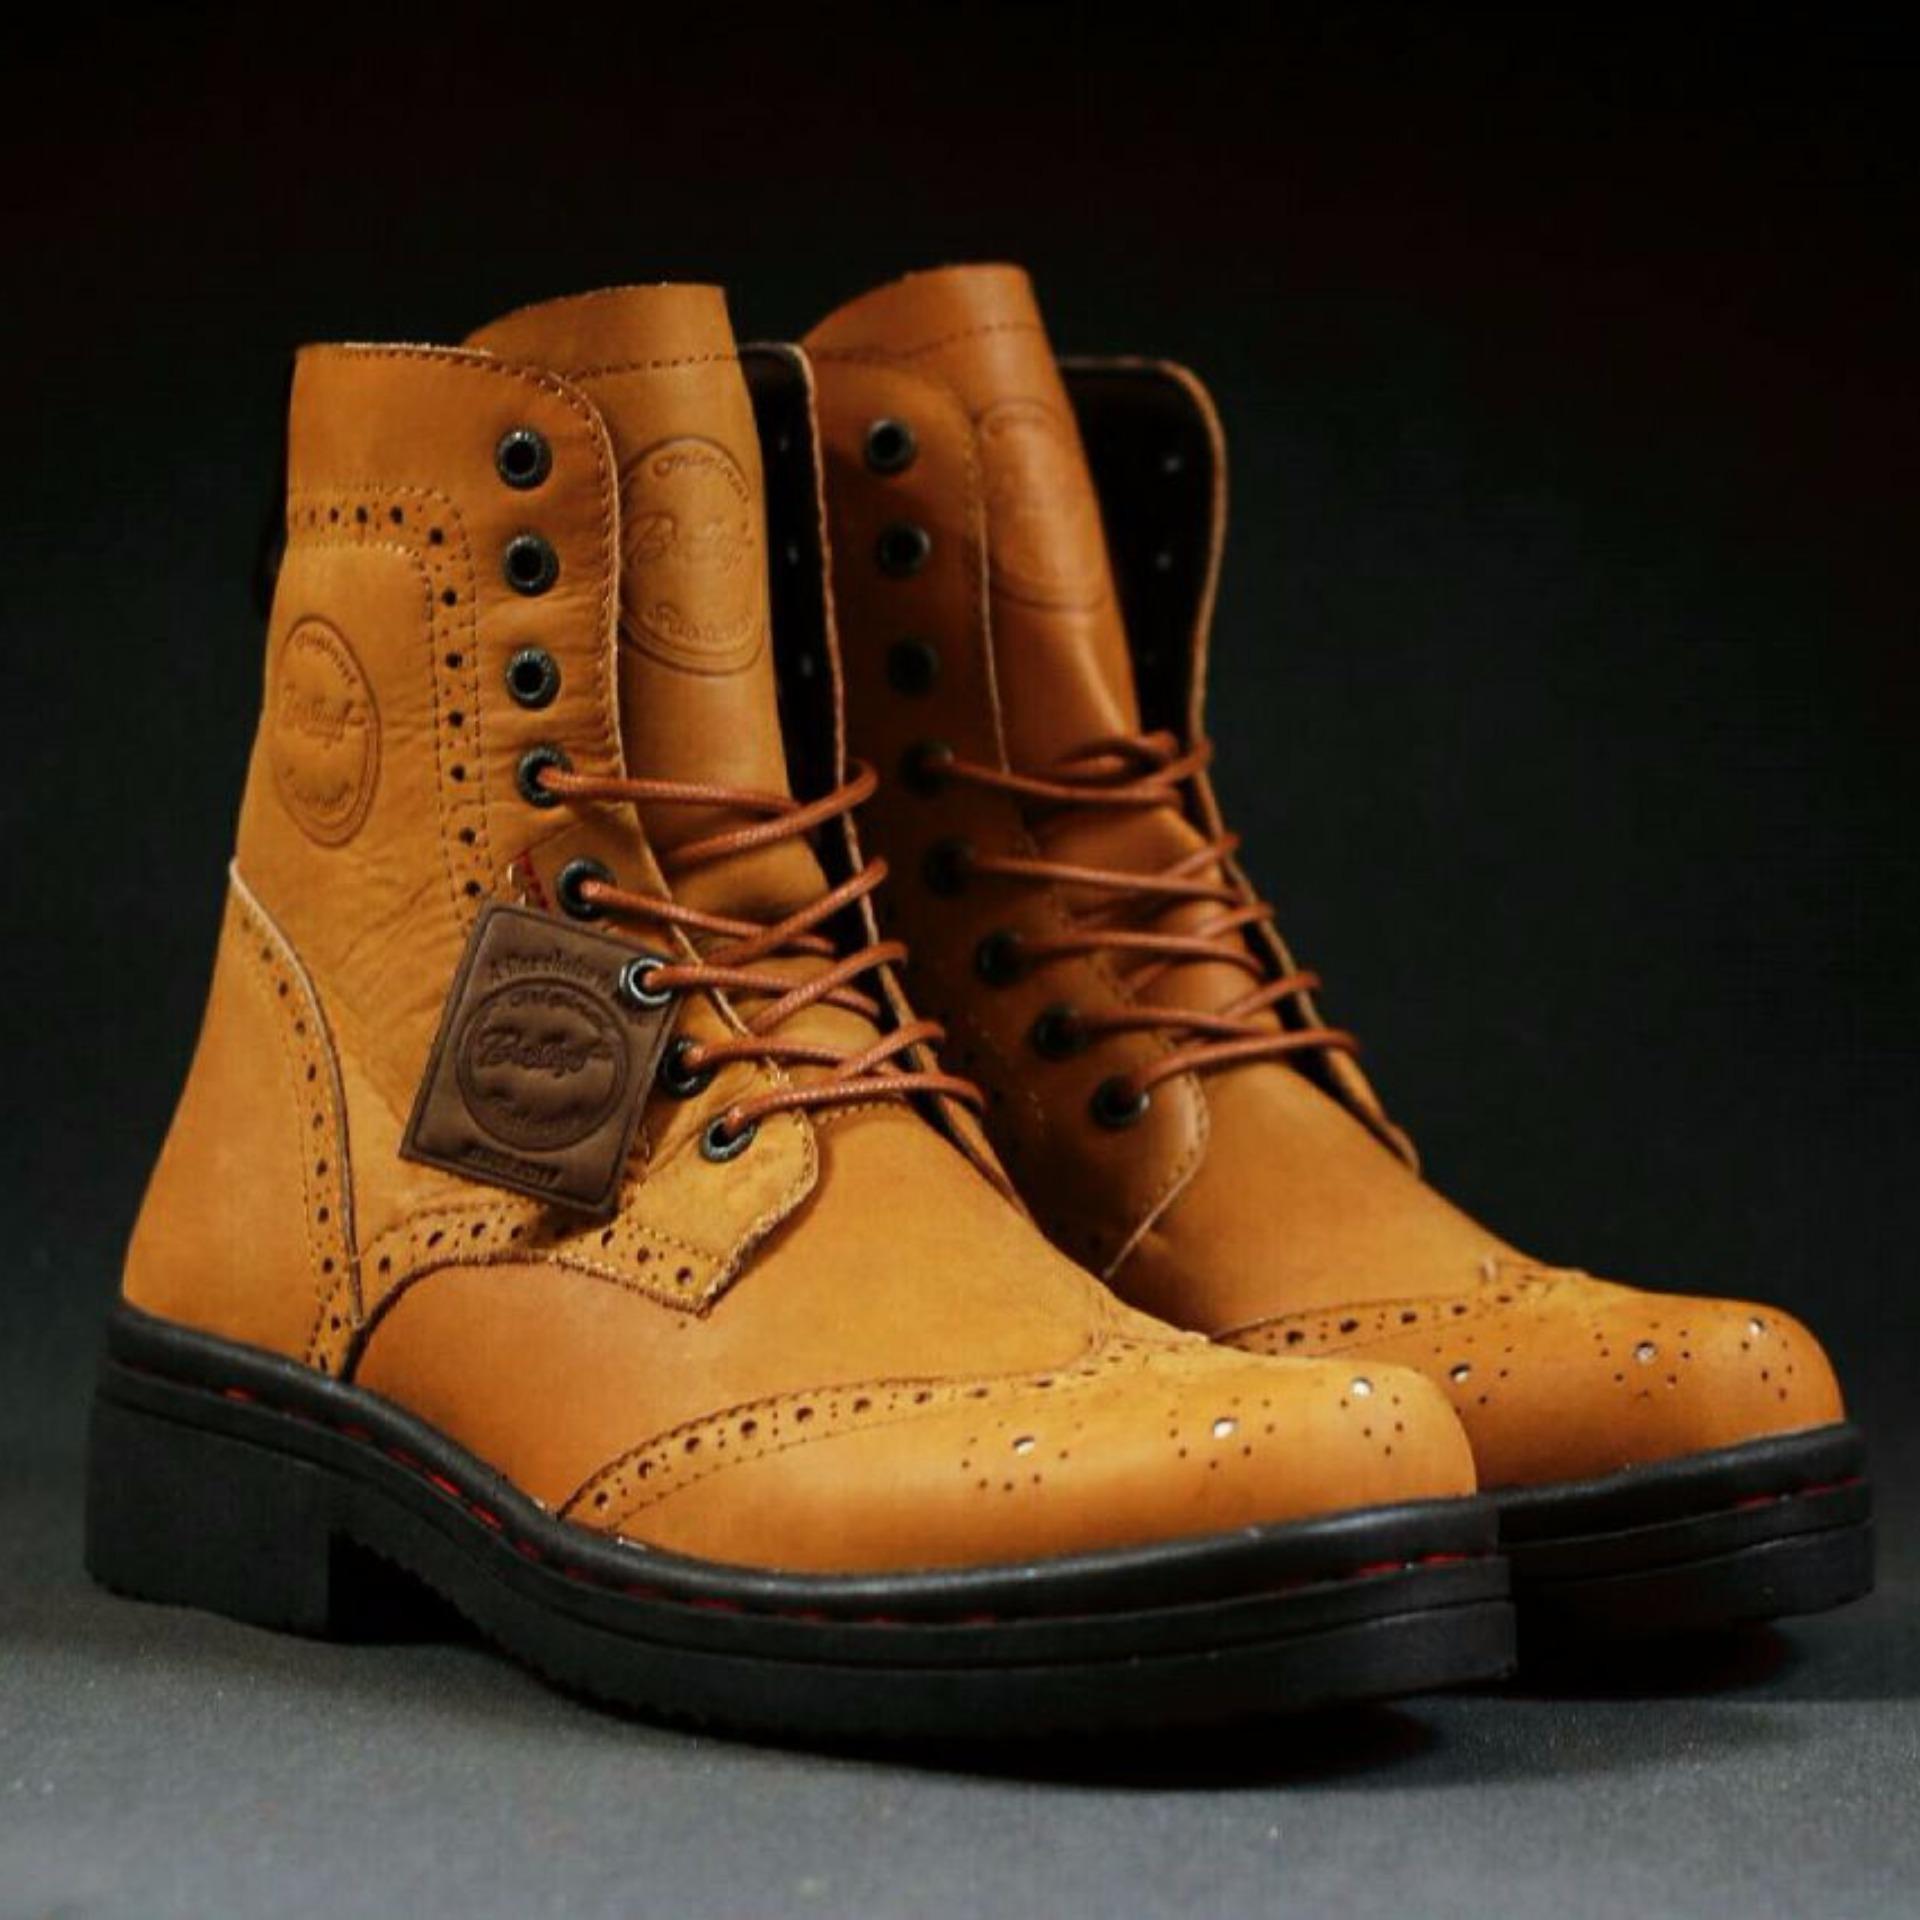 Sepatu Boots Berkendara Turing Sepatu Boots Anak Band Bradleys Adelardo Tan Promo Beli 1 Gratis 1